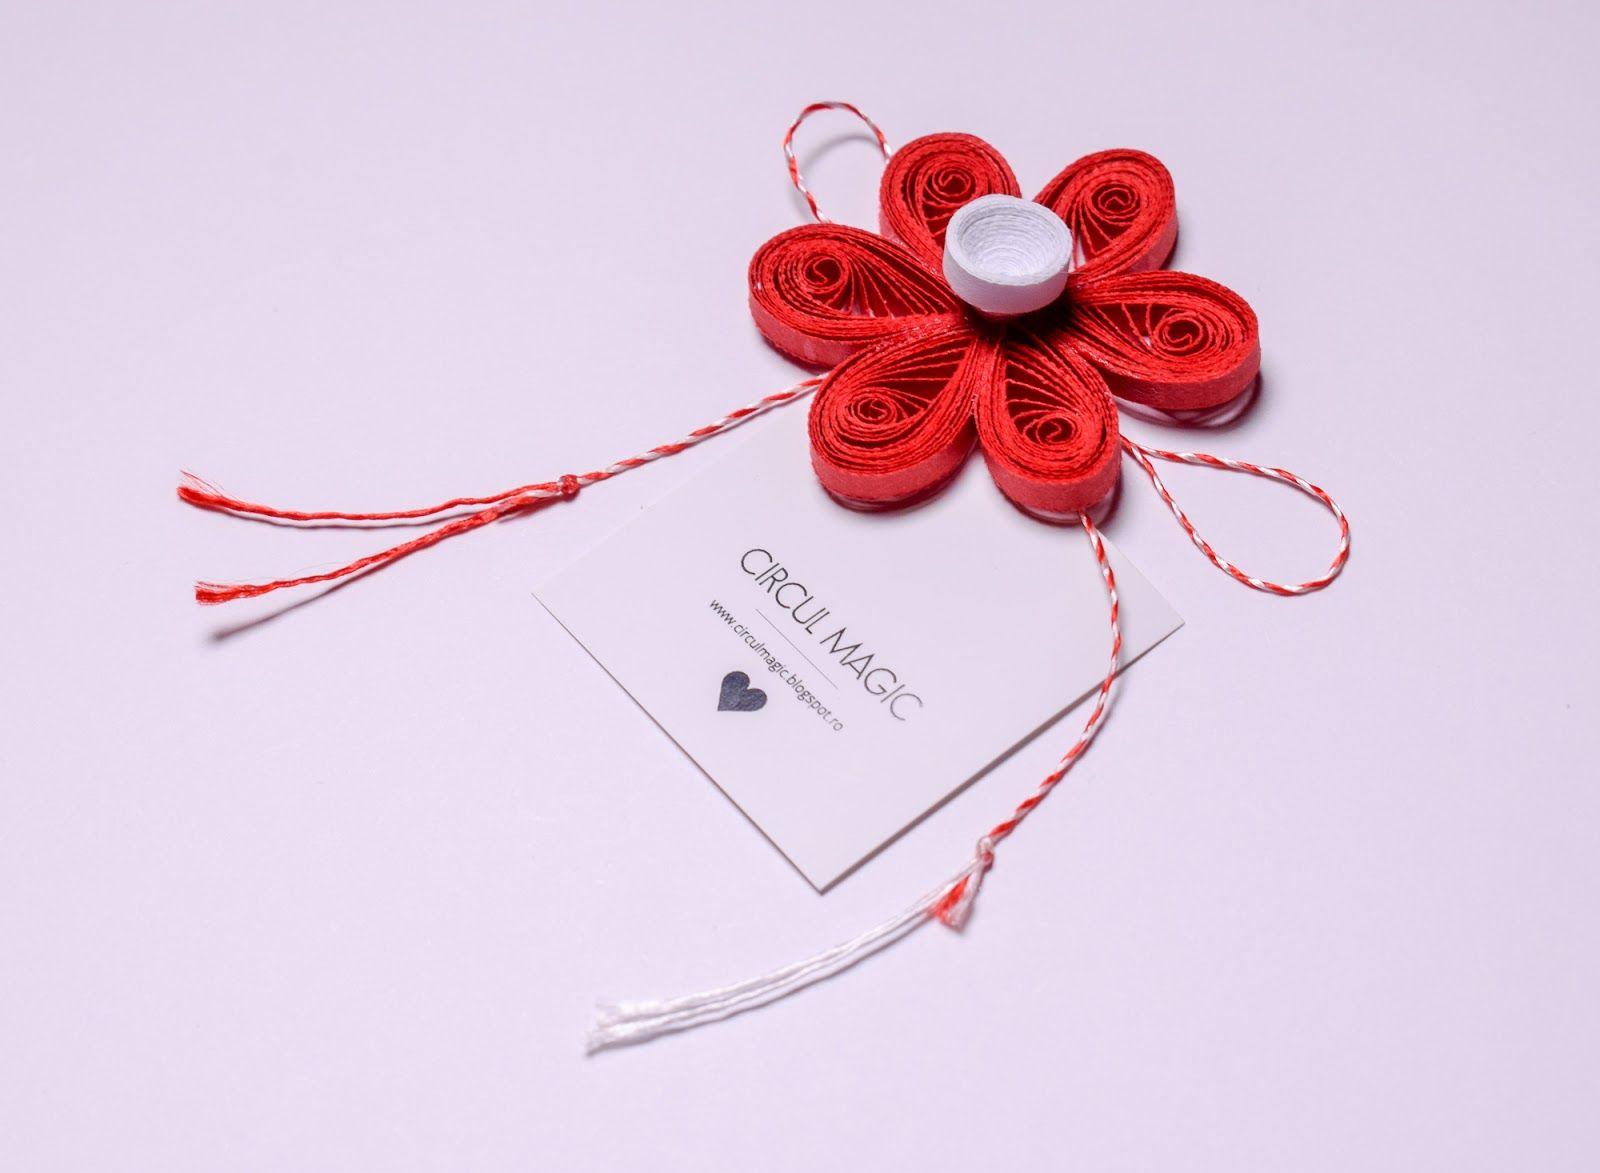 Quilling Paper Flower Diy Favor Red Flower Martisoare Handmade